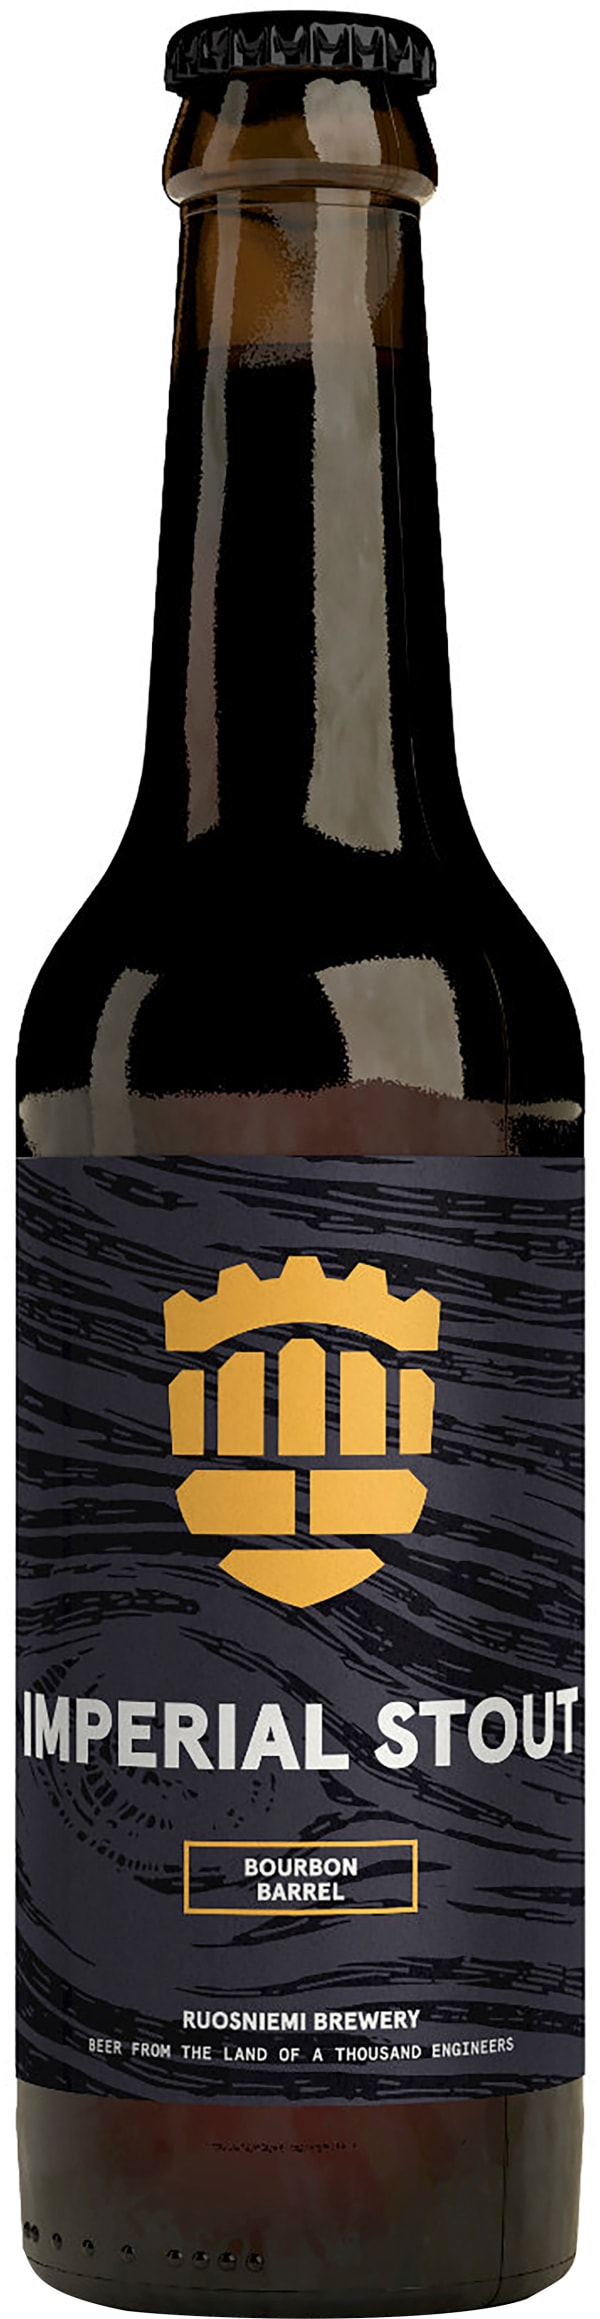 Ruosniemen Bourbon Barrel Imperial Stout 2019